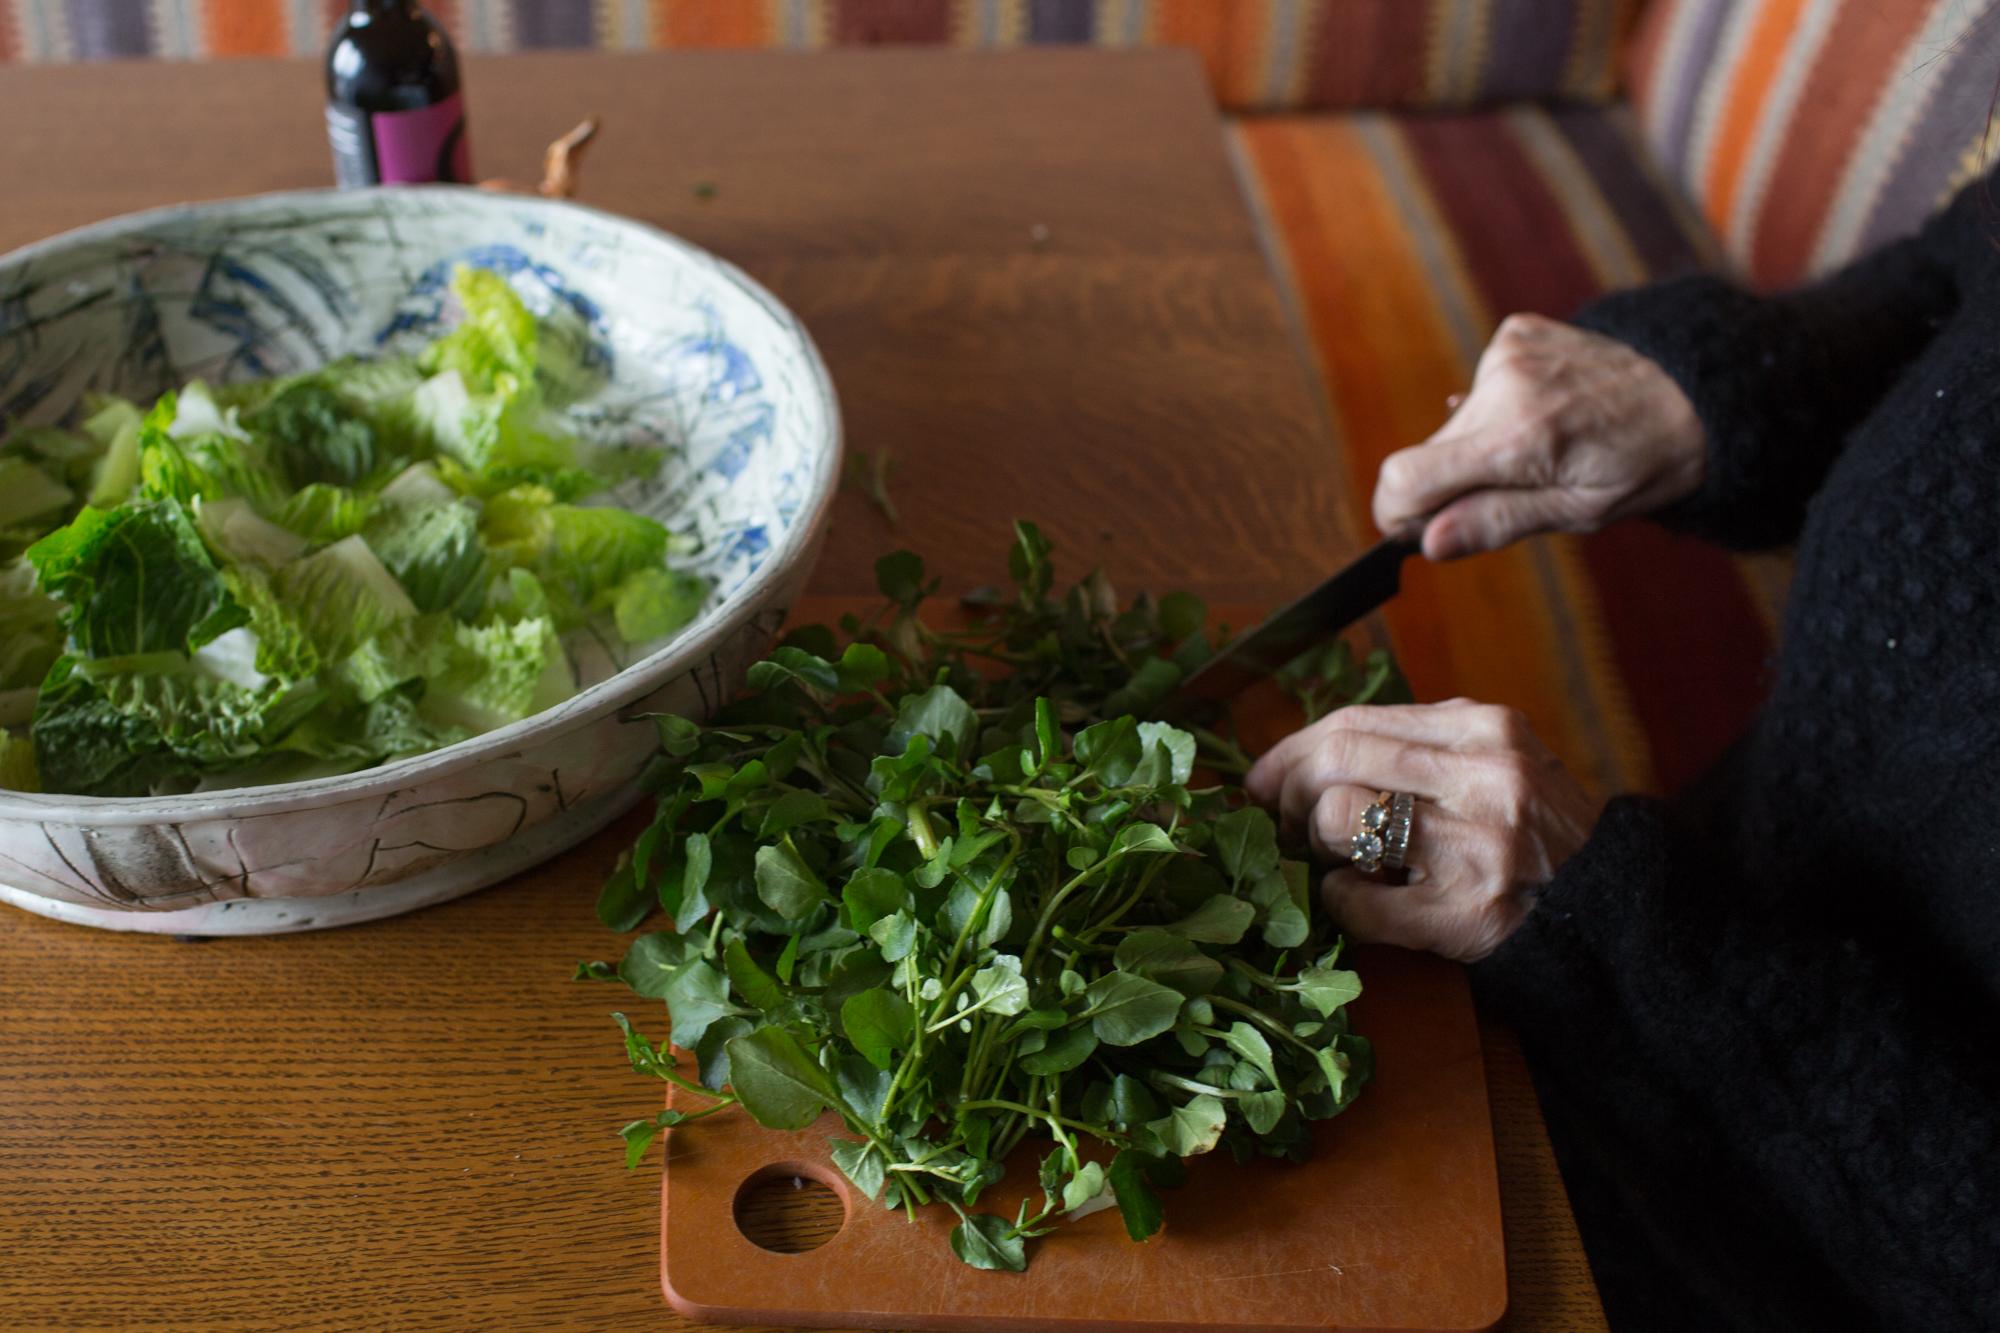 Mandy Aftel's Point Reyes Salad